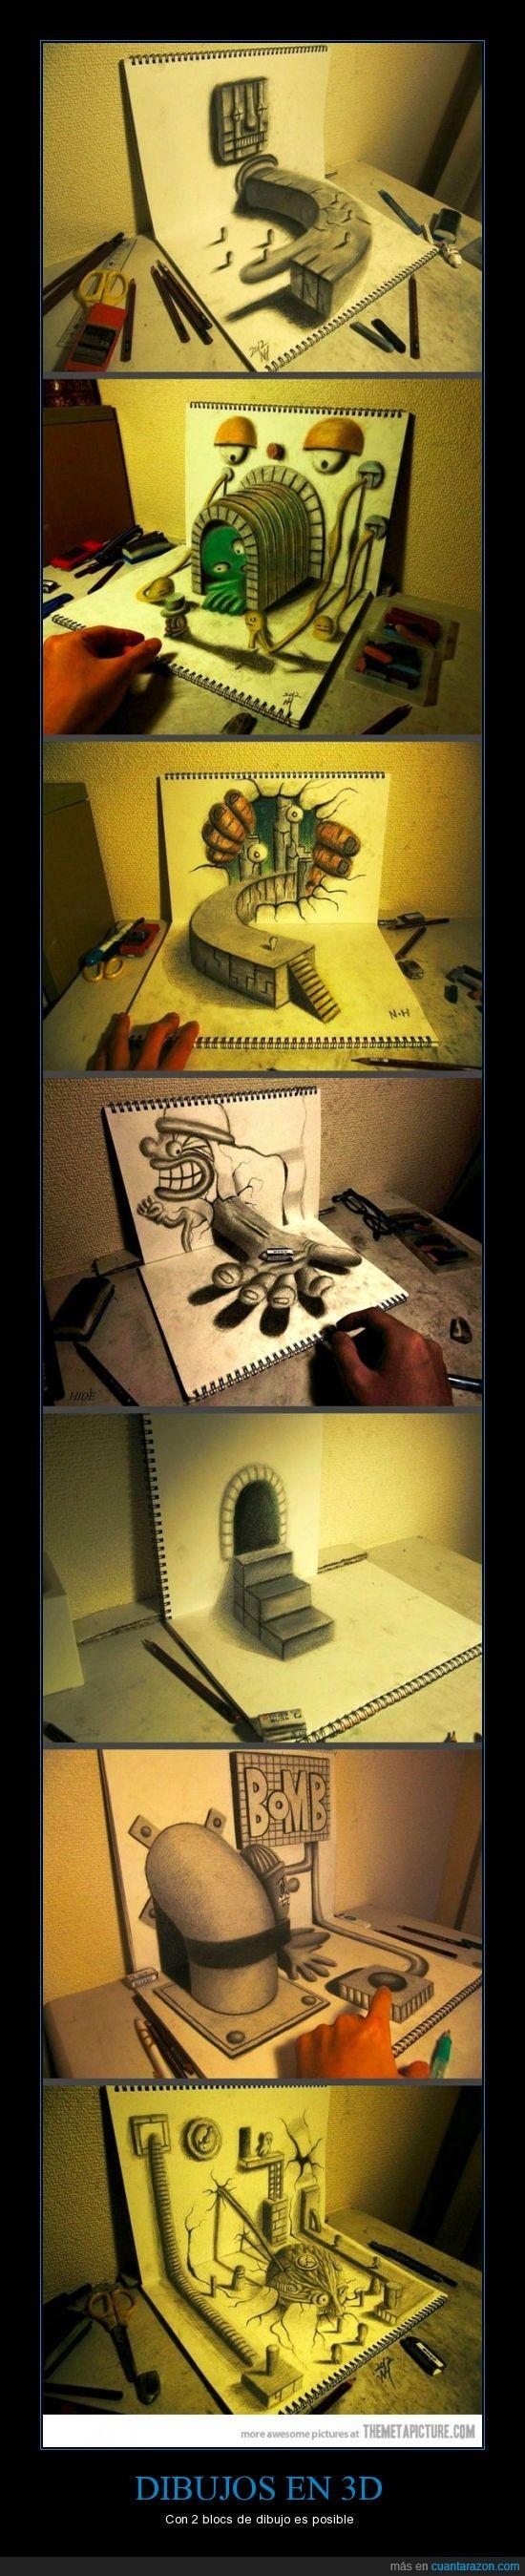 3D,bloc,dibujo,dibujos,epico,impresionante